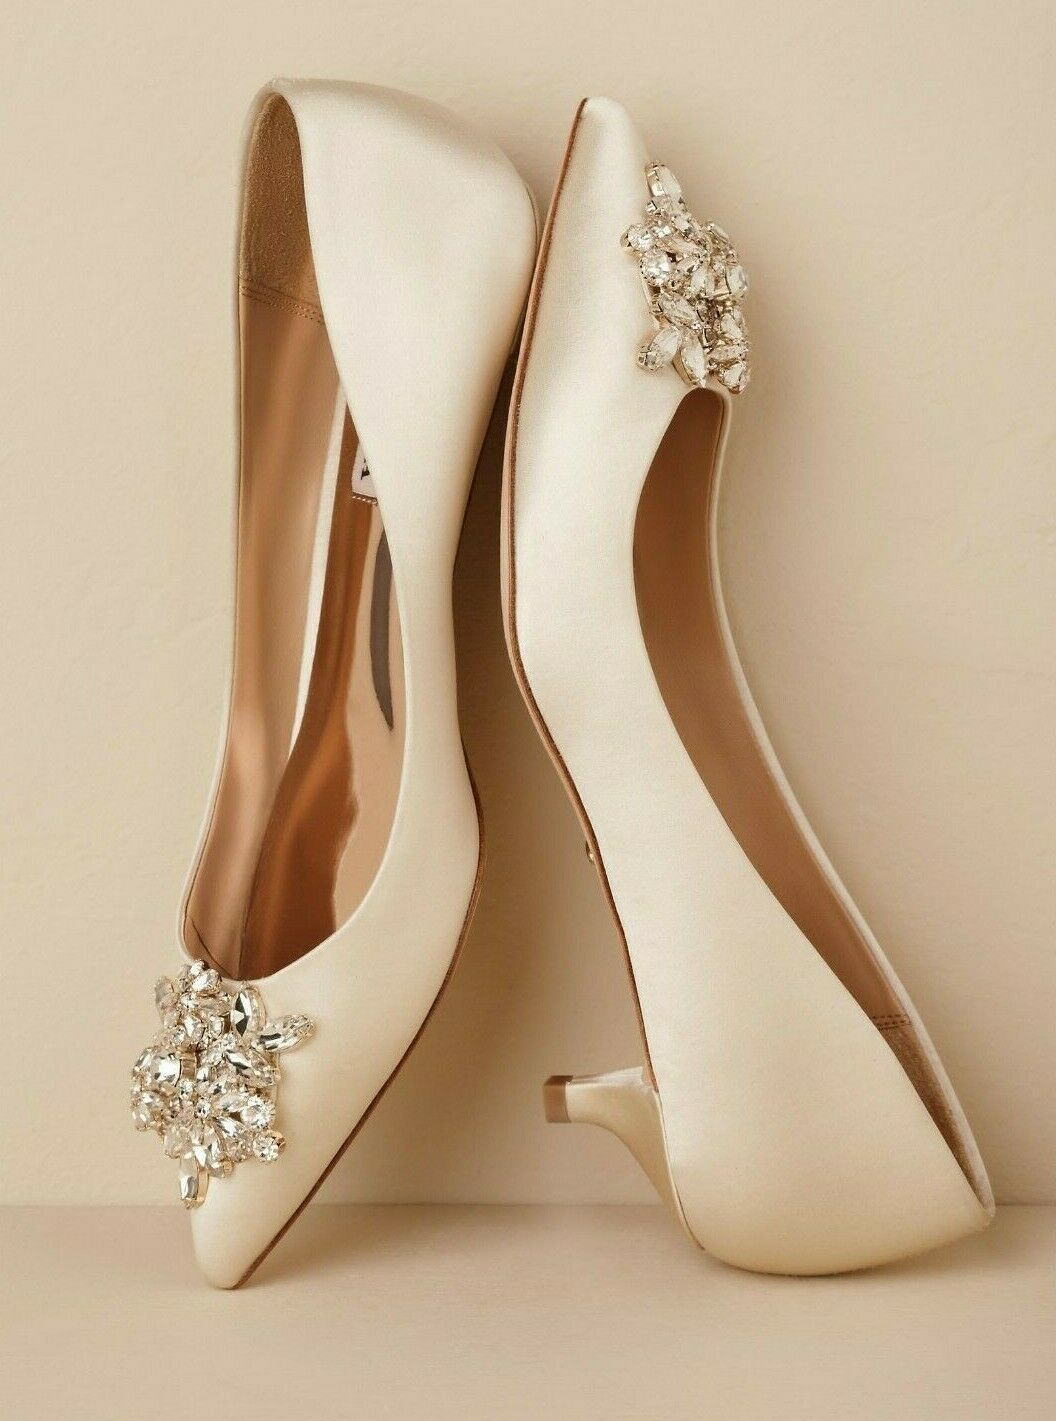 Https Www Ebay Com Itm Bhldn Badgley Michka Vail Size 8 5 Ivory Crystal Embellished Kitten Heel Pumps 283371287368 Has Bride Shoes Wedding Shoes Bridal Shoes